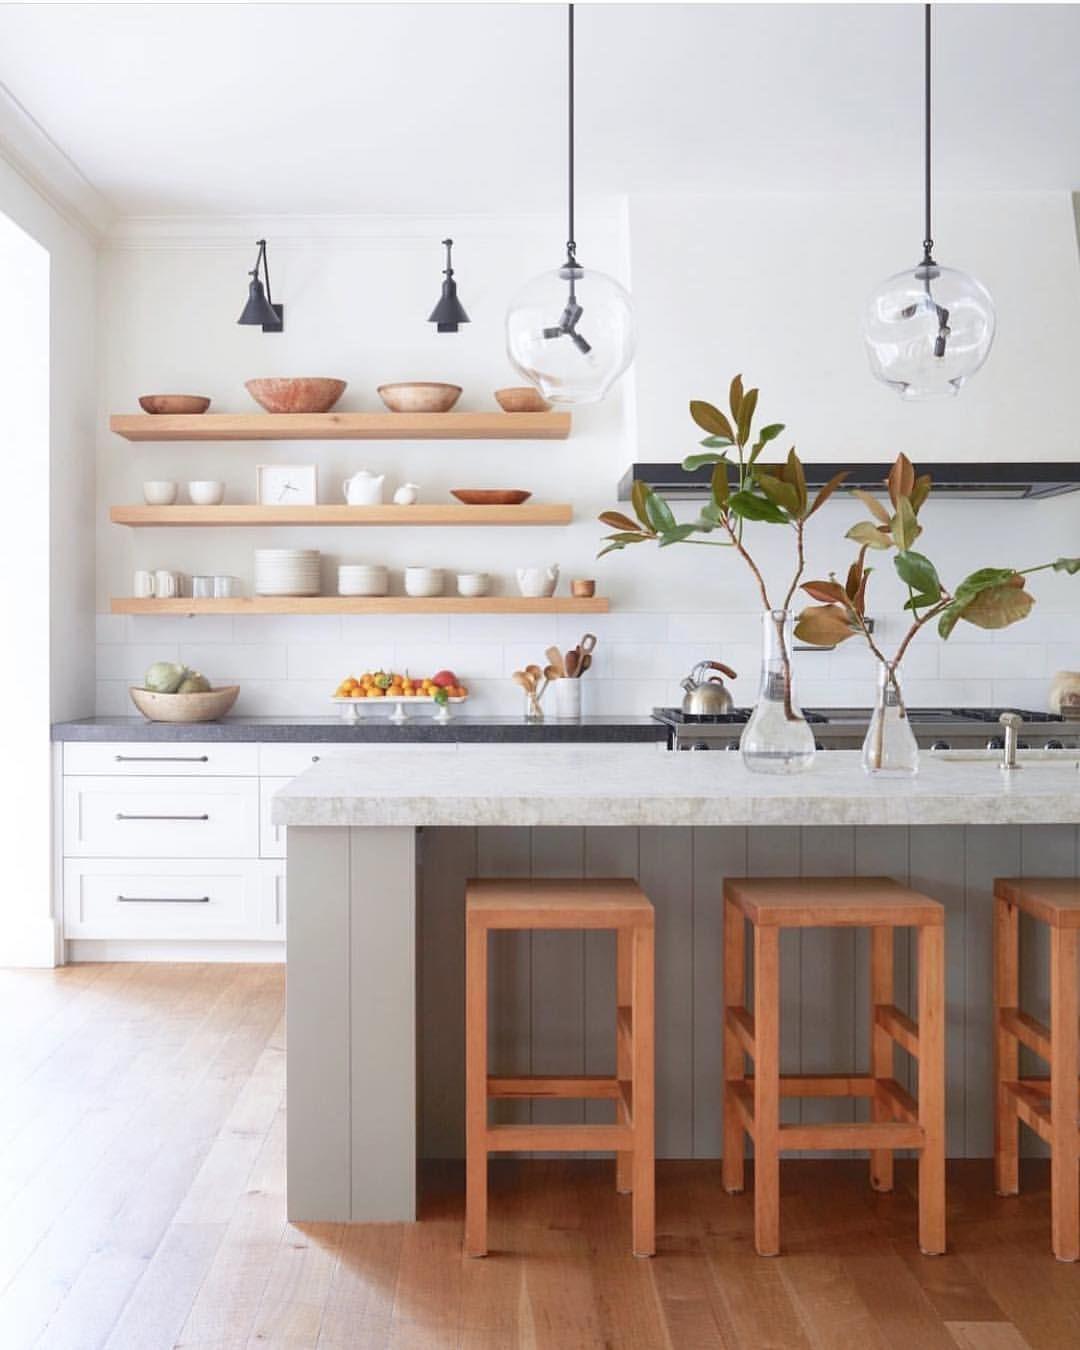 17 Most Amazing Scandinavian Boho Kitchen To Make Your Home A Better Place Scandinavian Kitchen Design Modern Kitchen Open Minimalist Kitchen Design